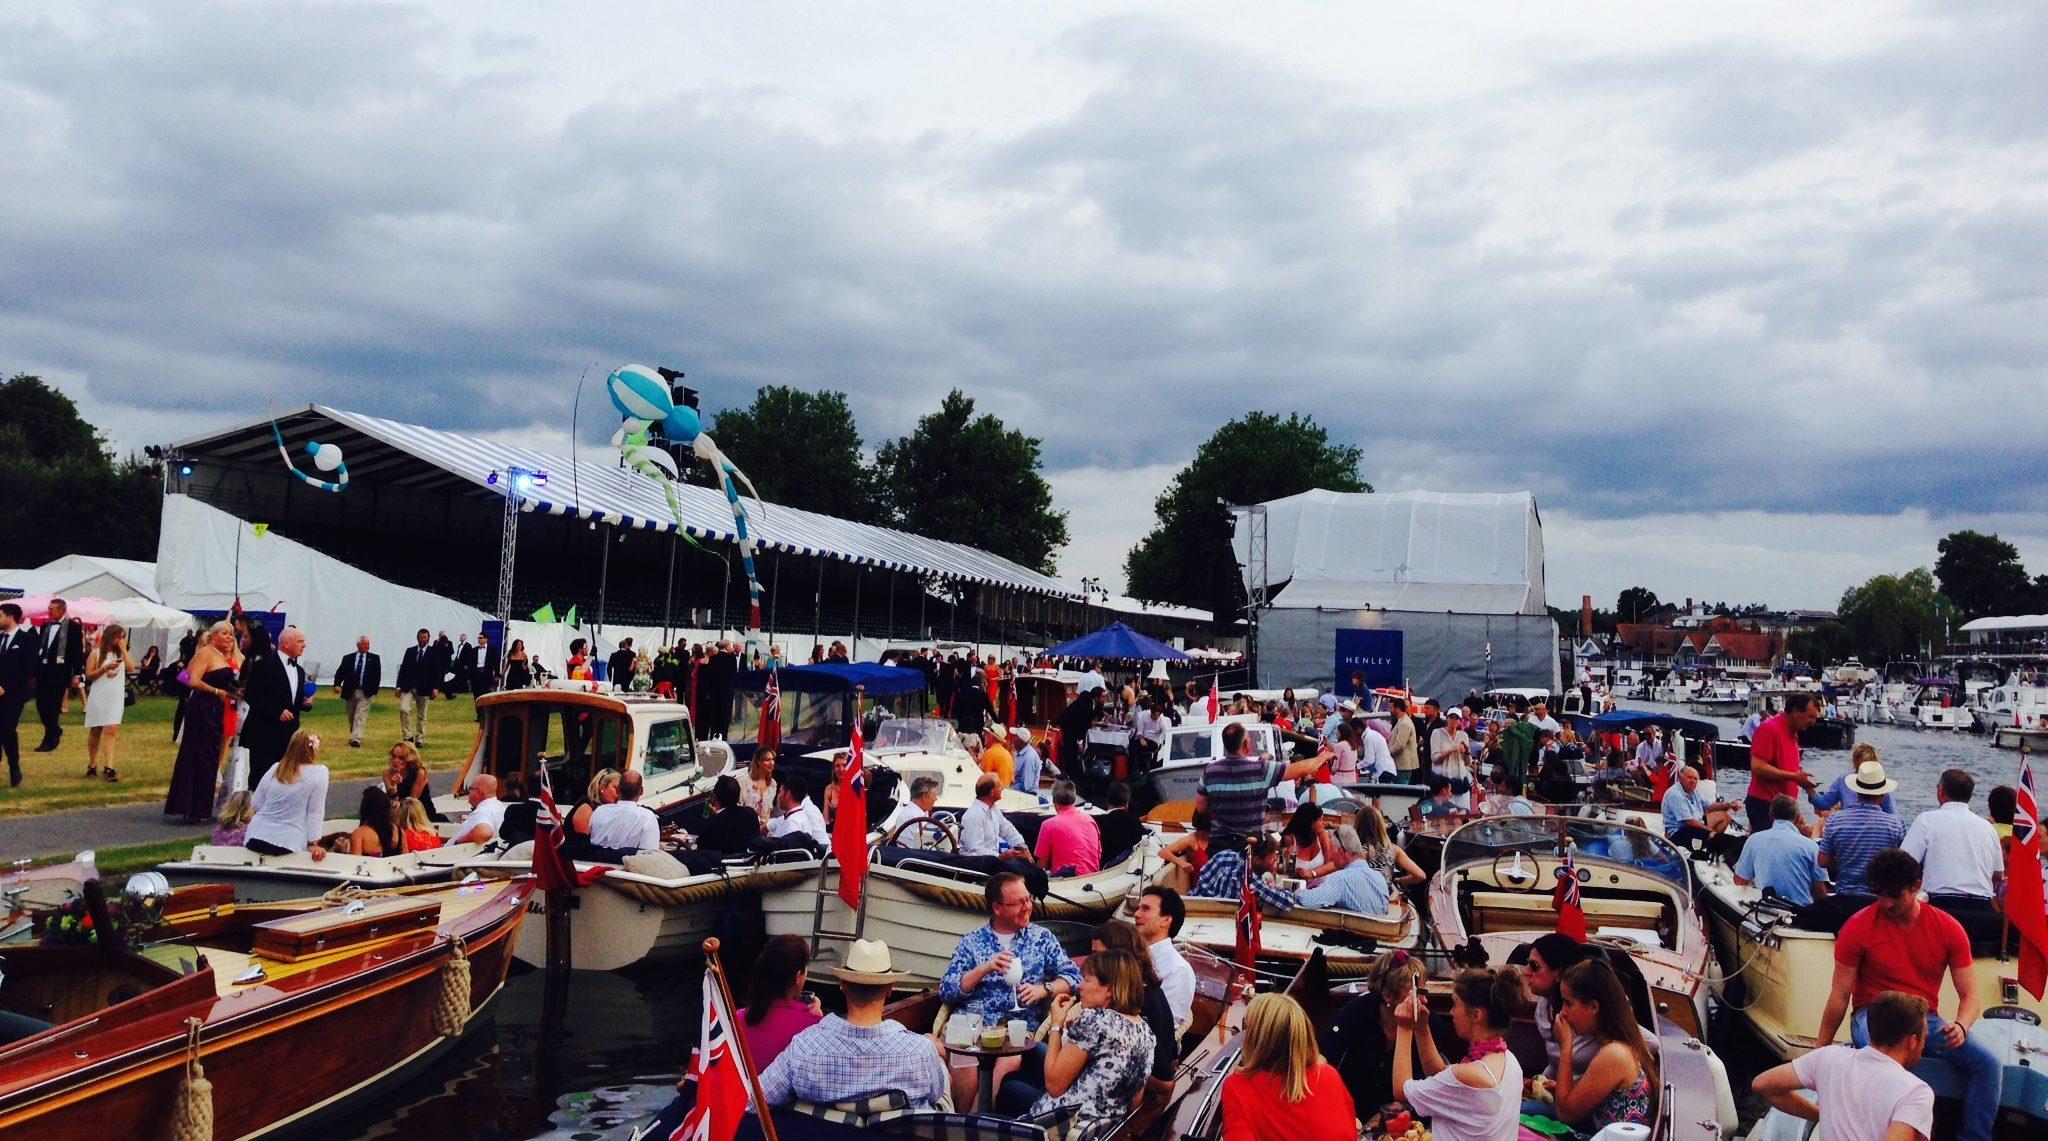 Sea of boats in the Festival enclosure in 2015